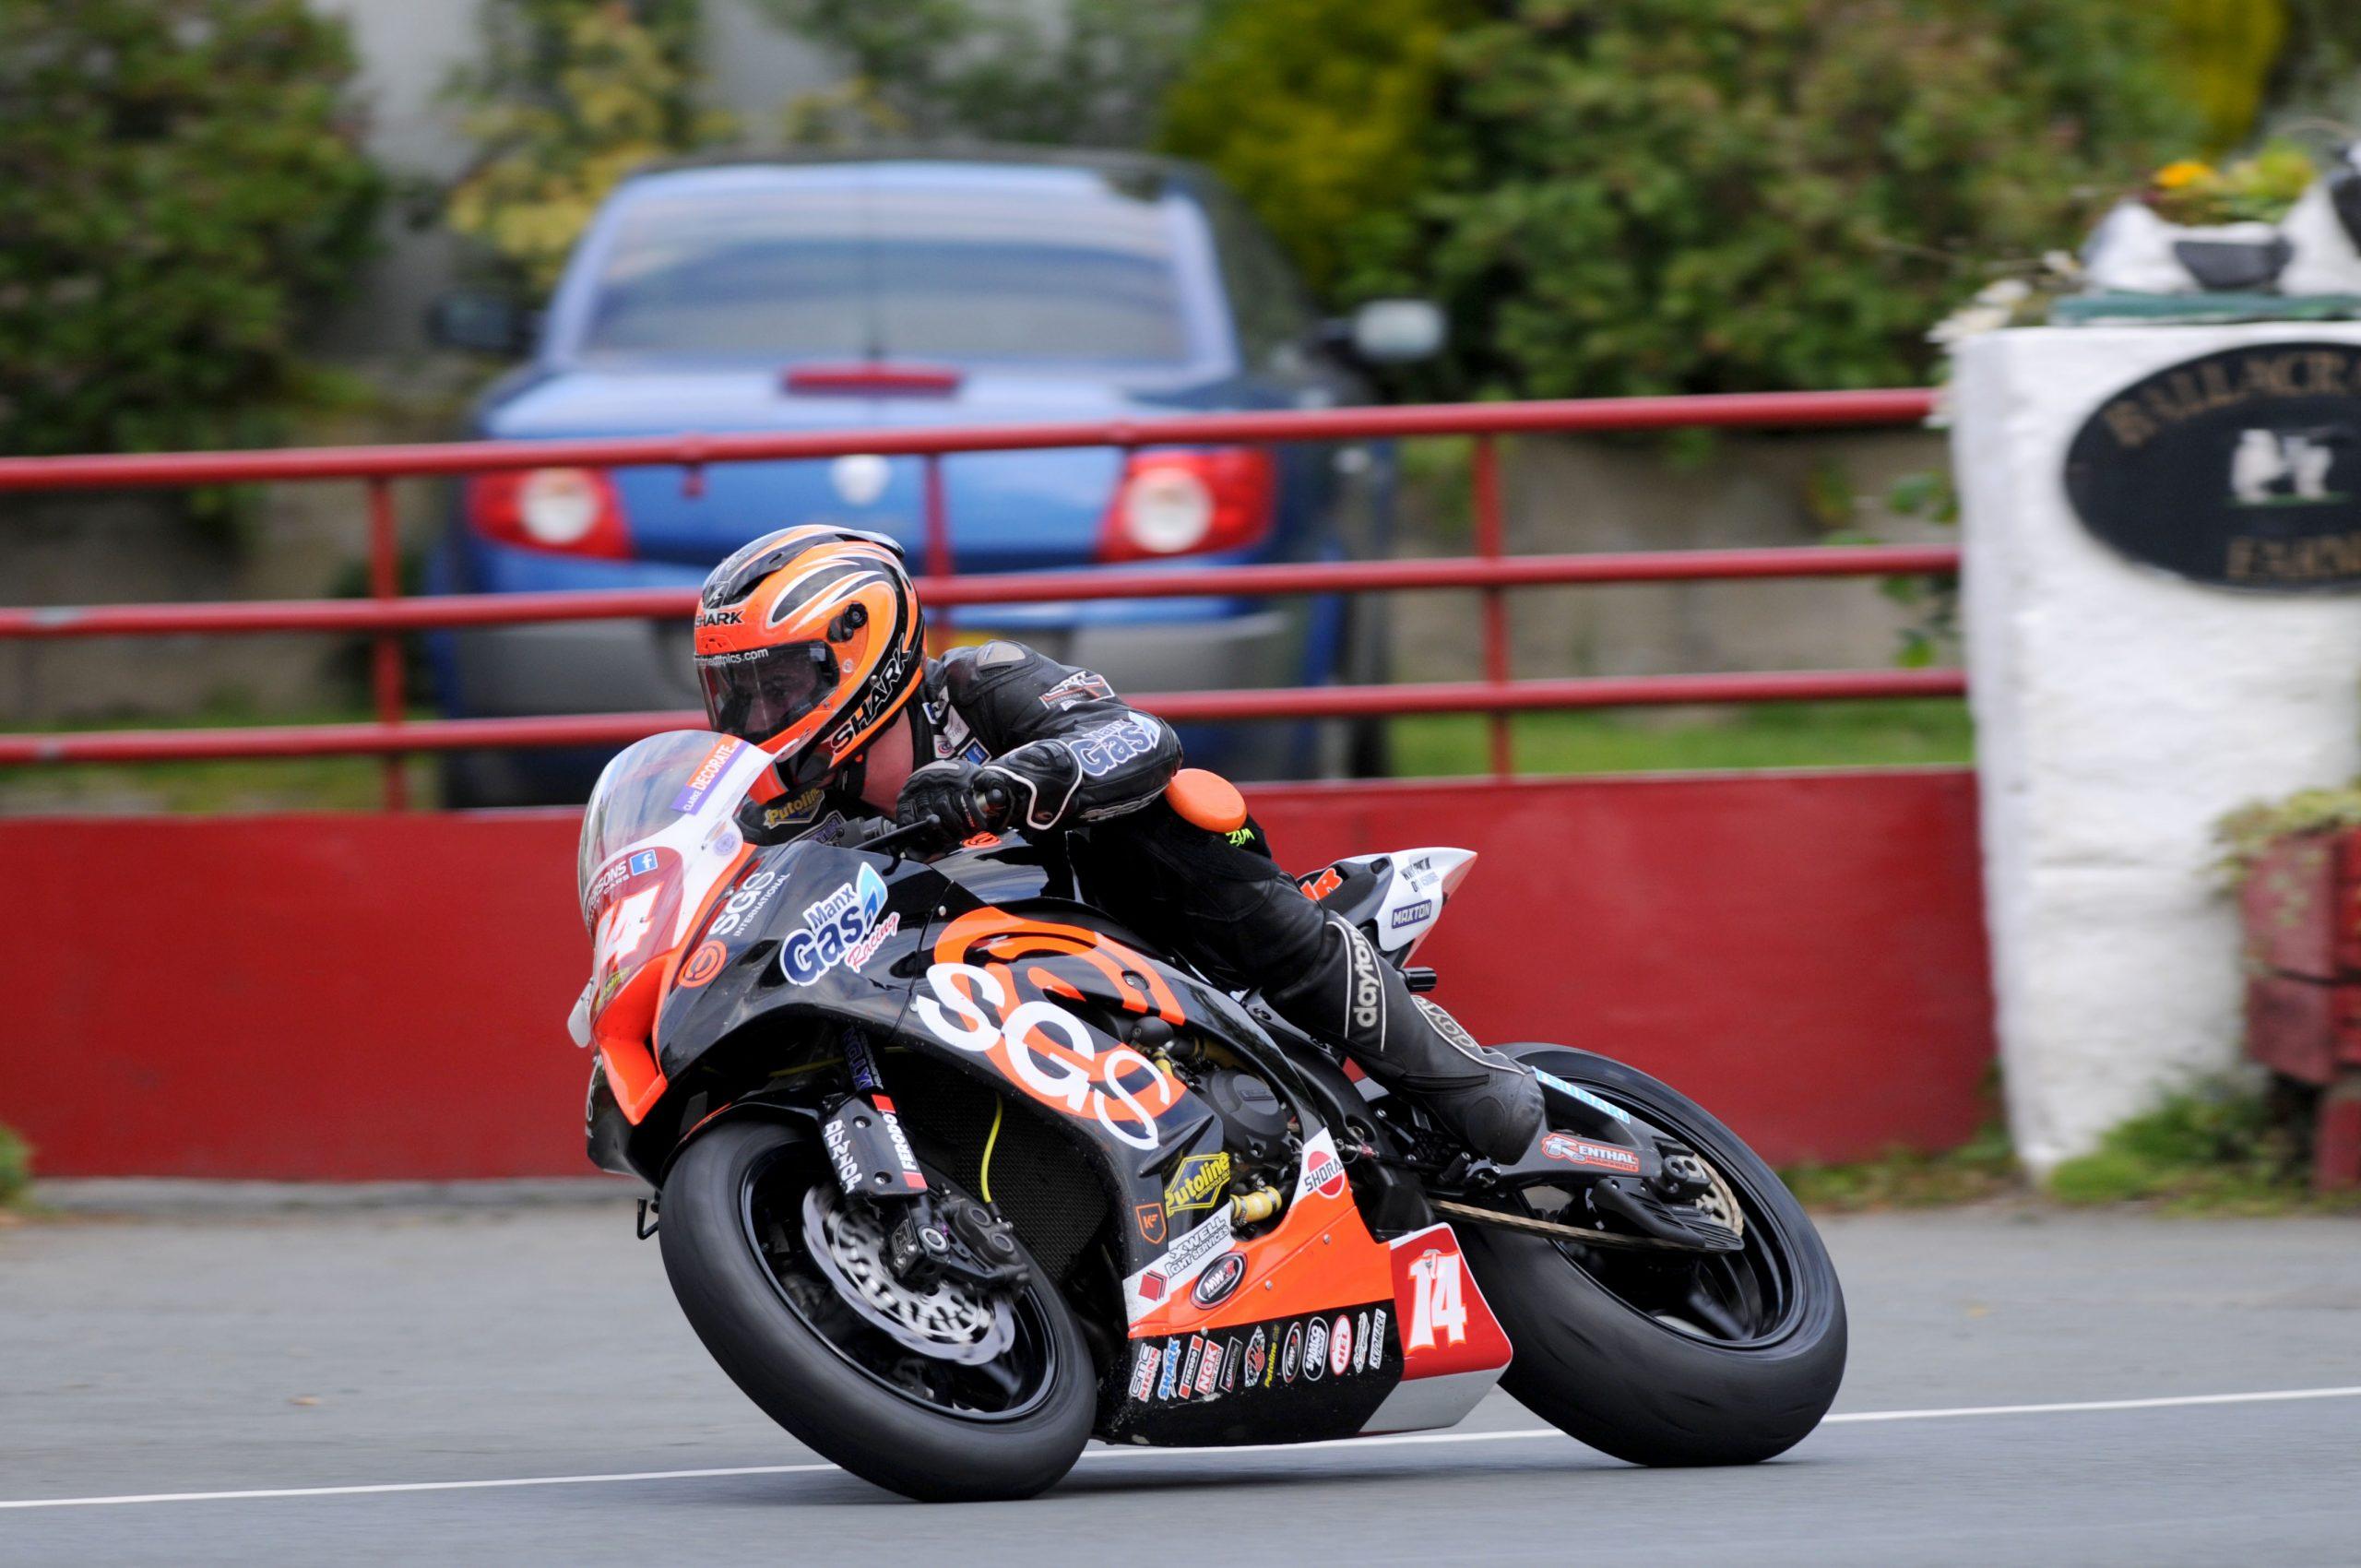 Ryan Farquhar on the SGS/Manx Gas KMR Kawasaki